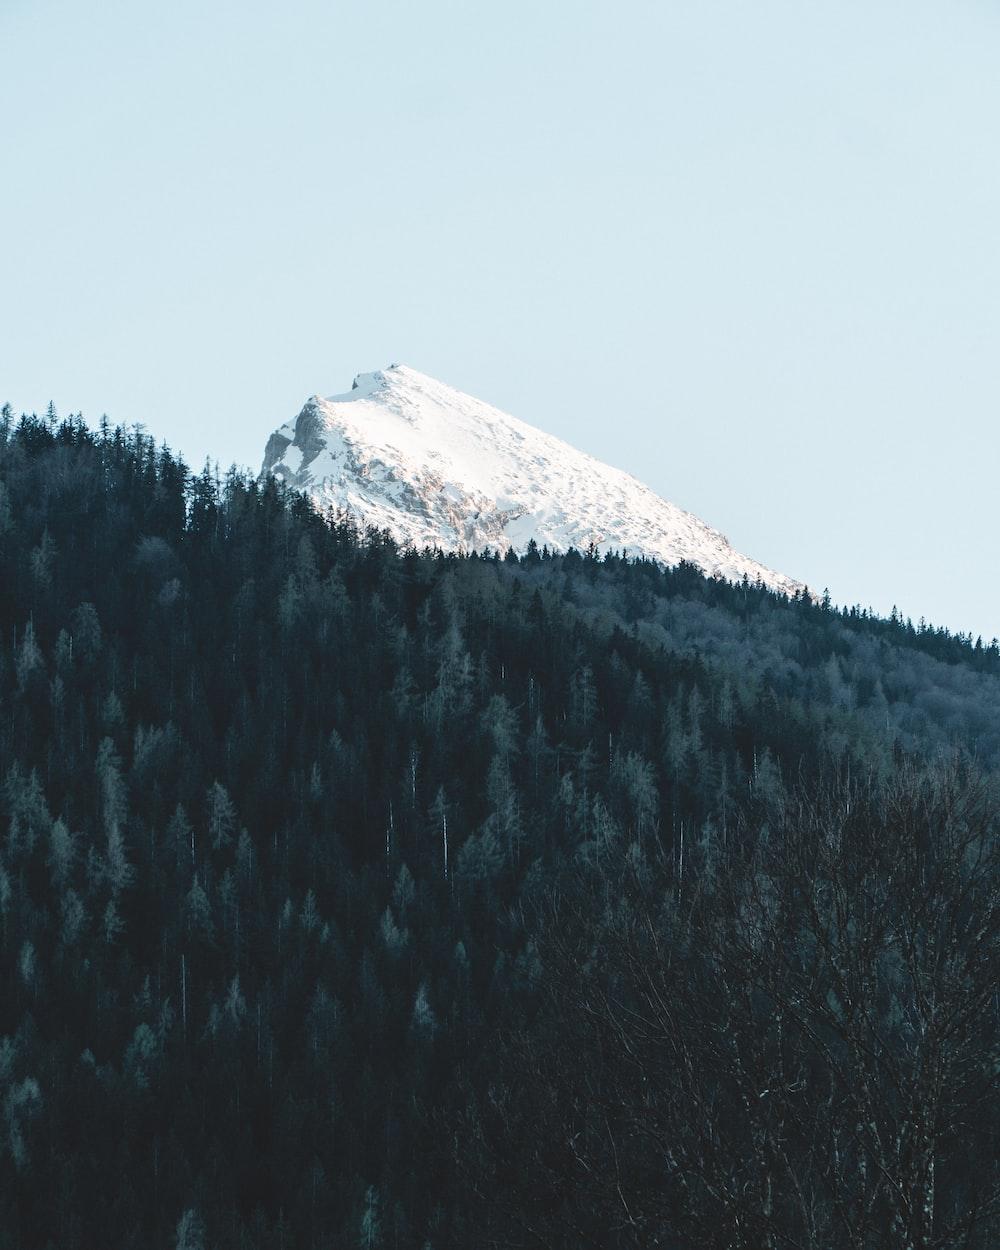 white snow capped mountain peak across green pine forest